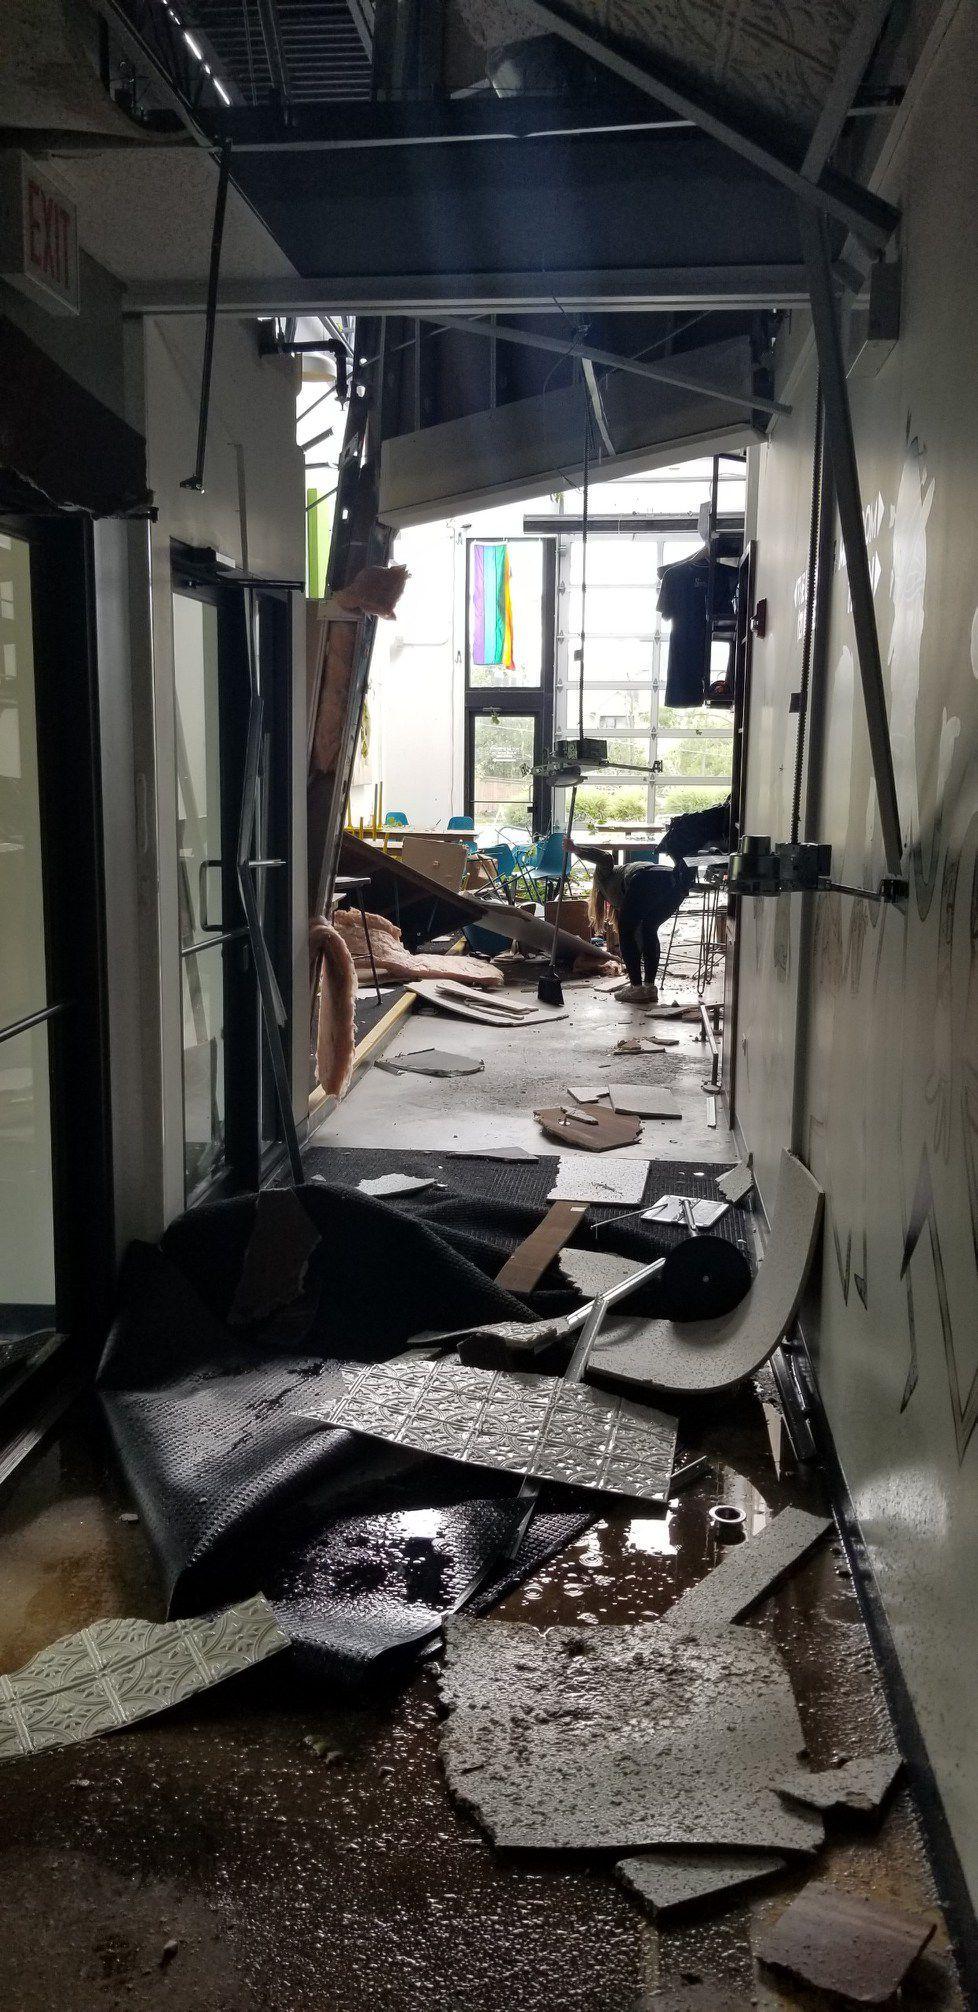 A hallway damaged by a storm